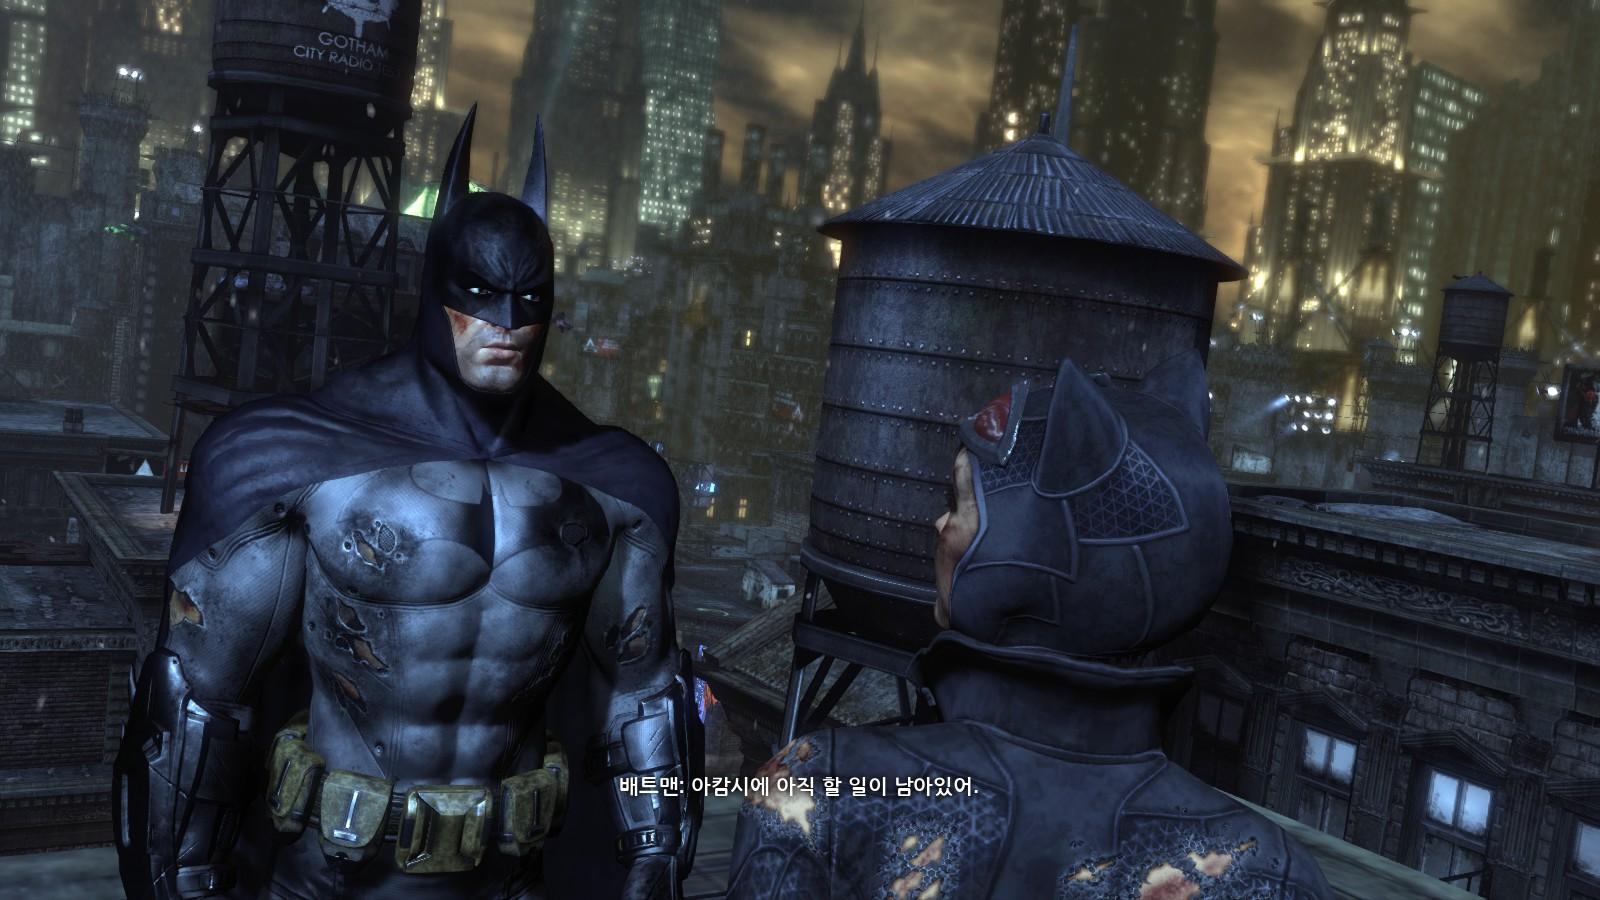 [BATMAN : ARKHAM CITY] 수수께끼 완료!